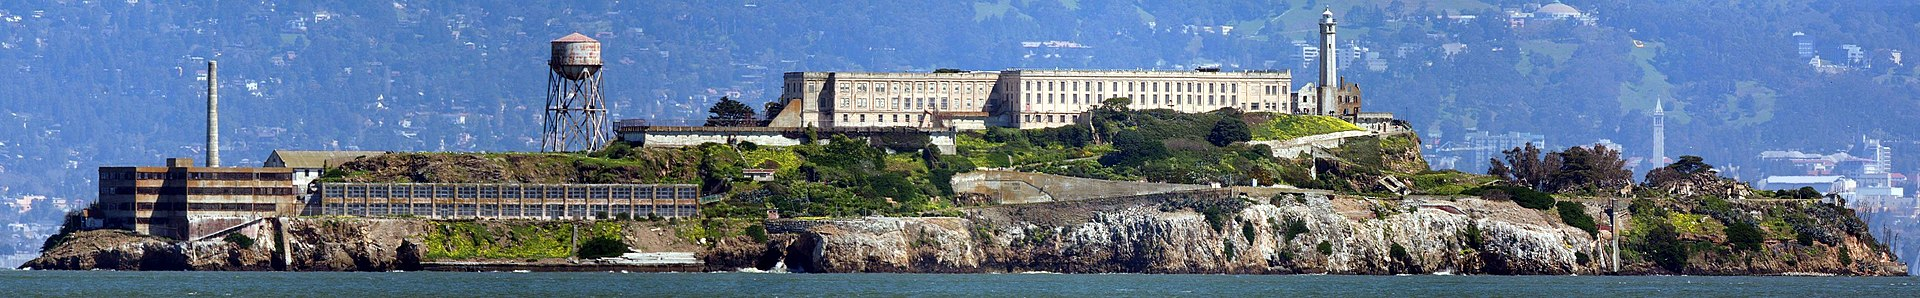 1920px-Alcatraz03182006.jpg